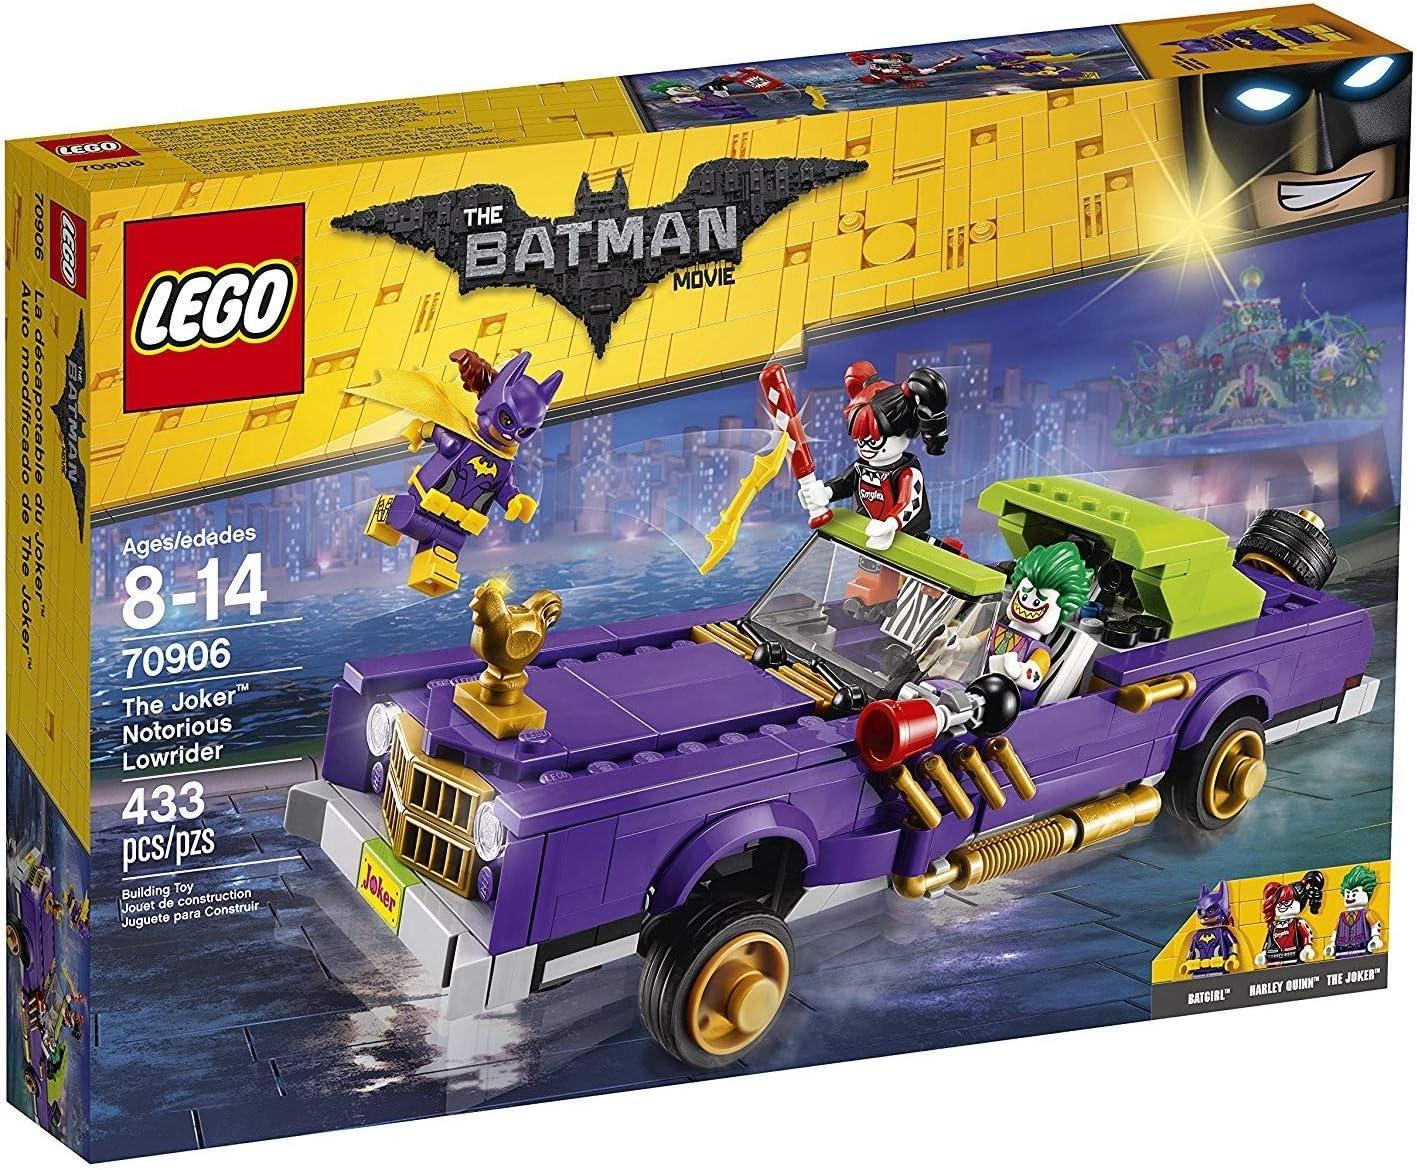 LEGO The LEGO Batman Movie 70906 The Joker Notorious Lowrider NEW